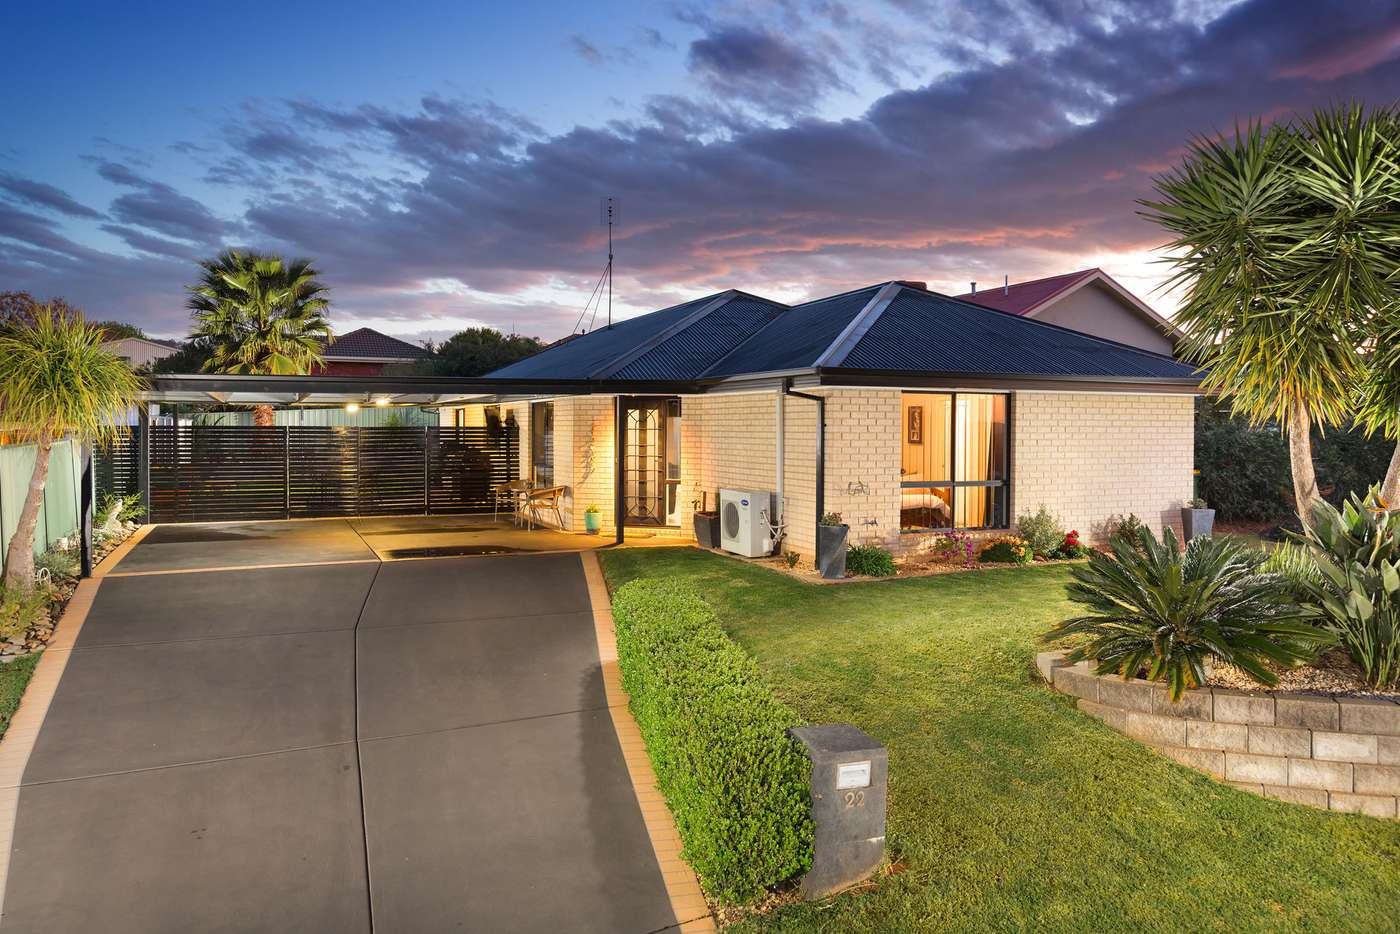 Main view of Homely house listing, 22 Samantha Terrace, Wodonga VIC 3690